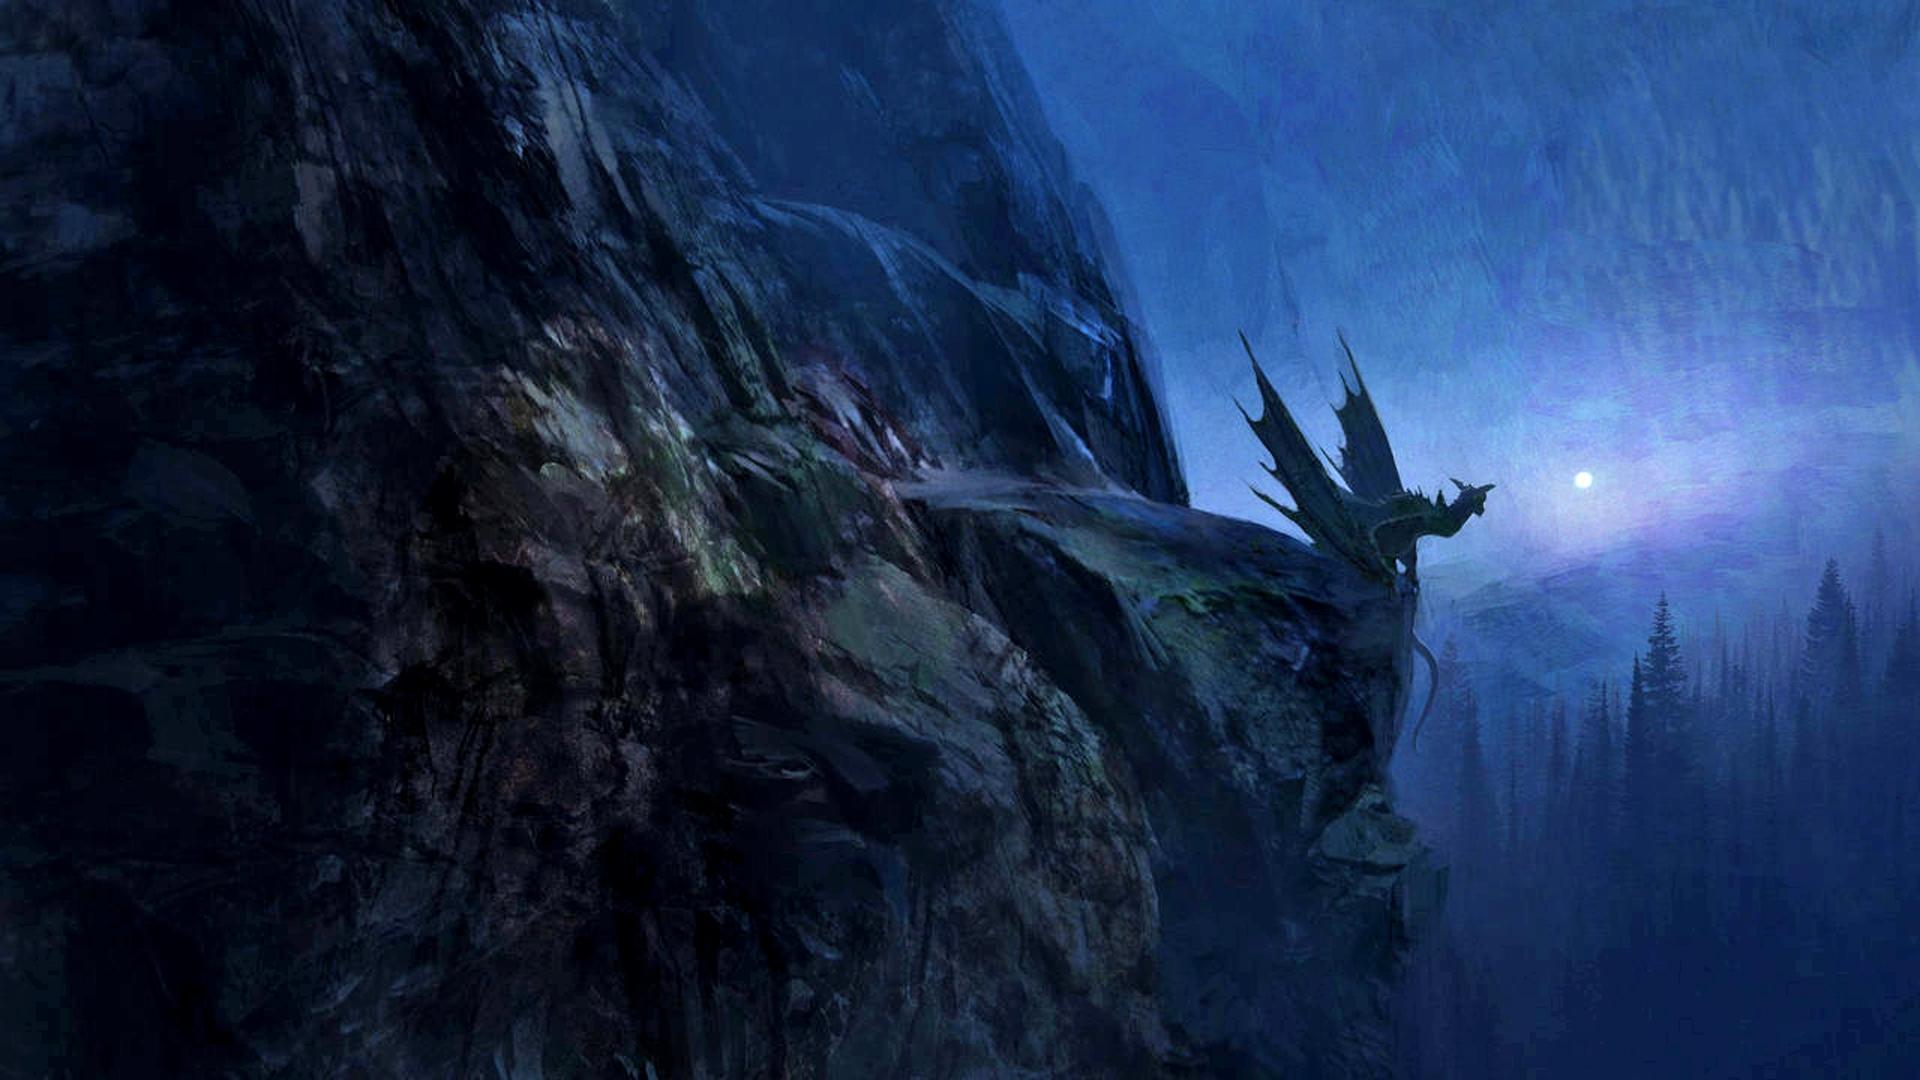 dark, magic, fantasy, dragon, landscape :: Wallpapers